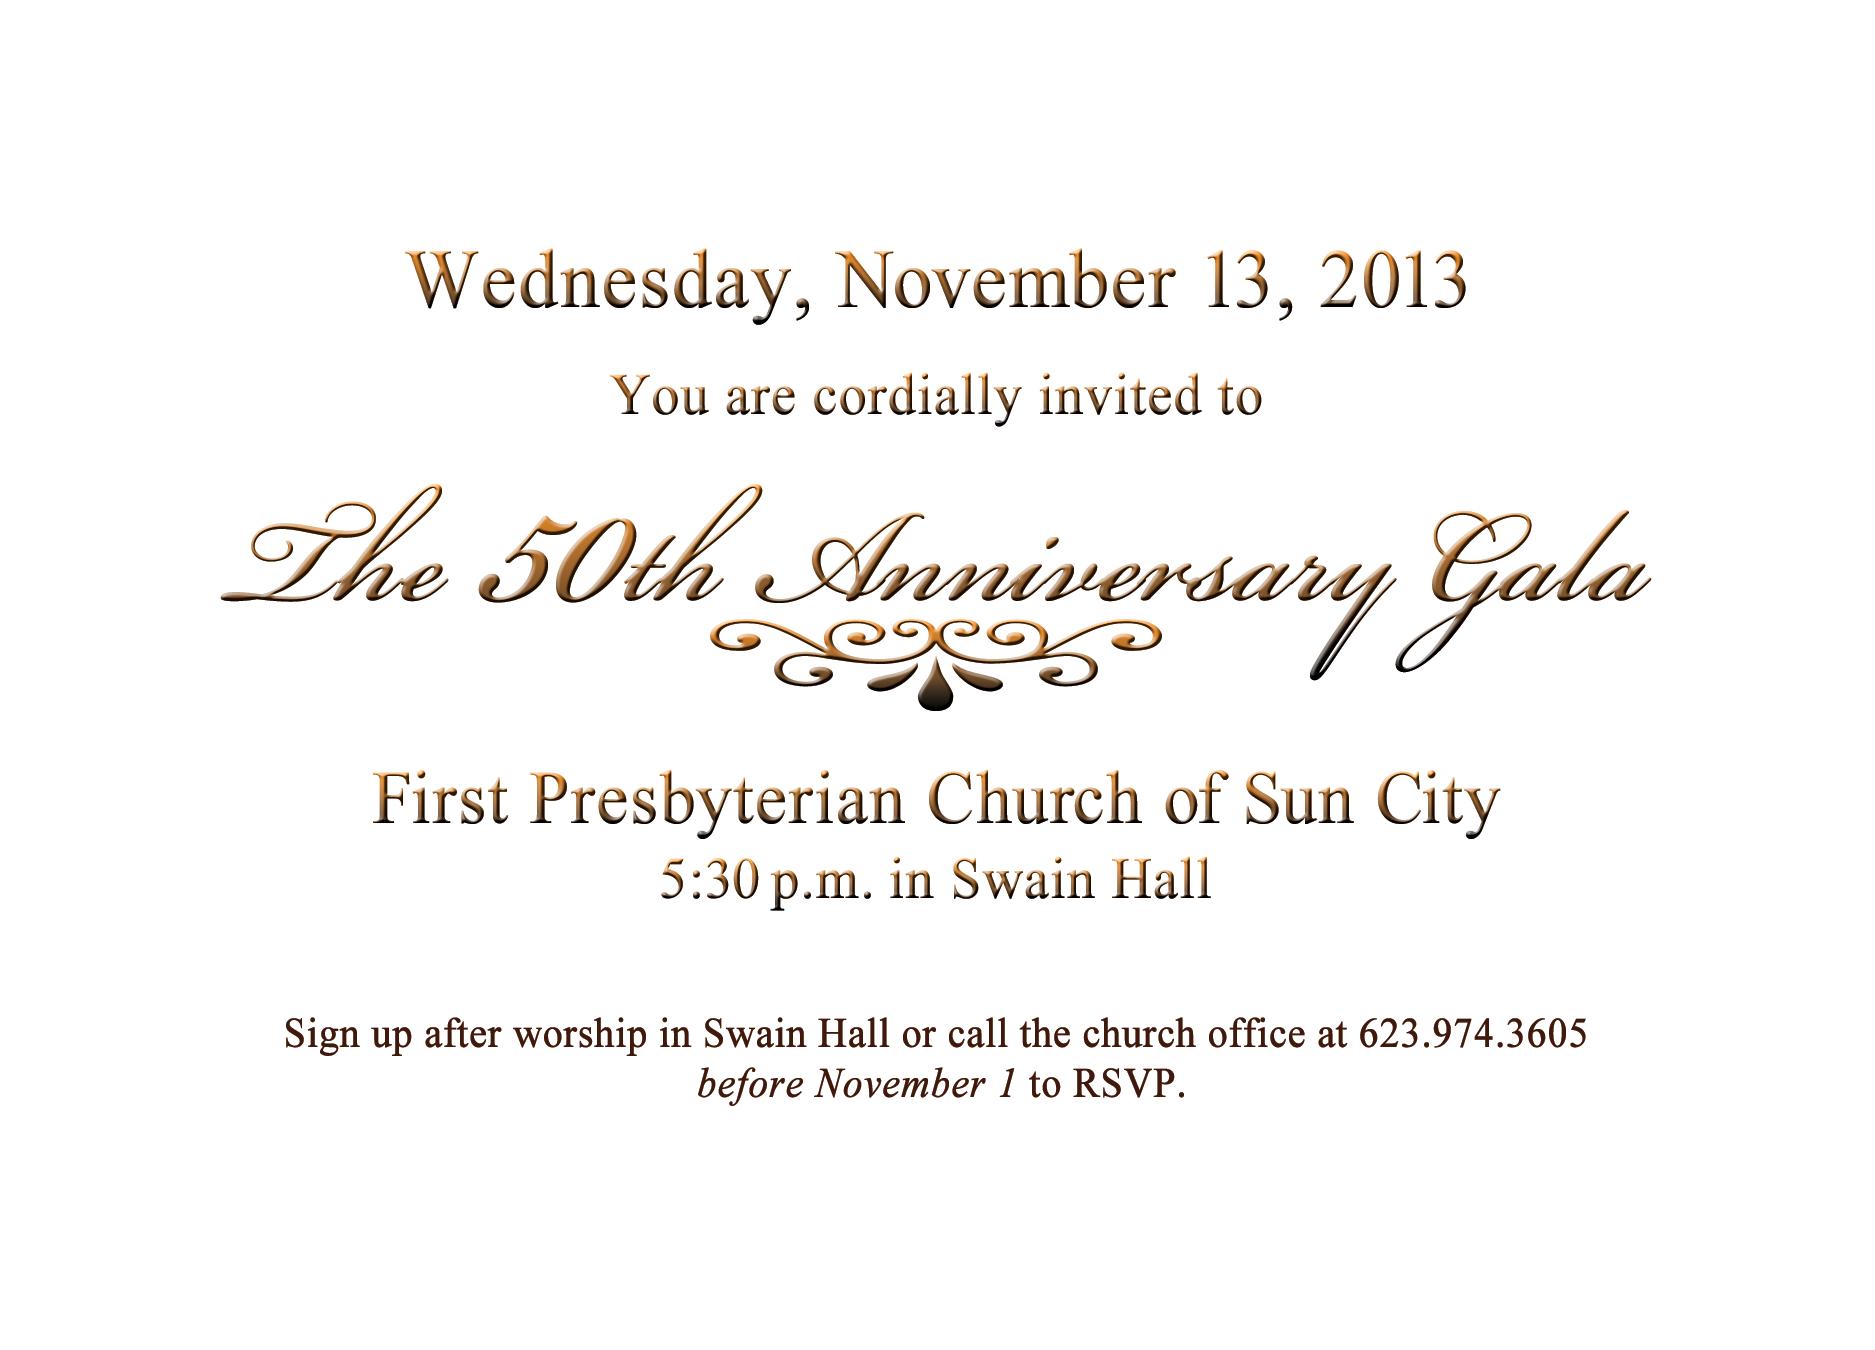 Invitation to 50th anniversary gala dinner church events invitation to 50th anniversary gala dinner stopboris Images